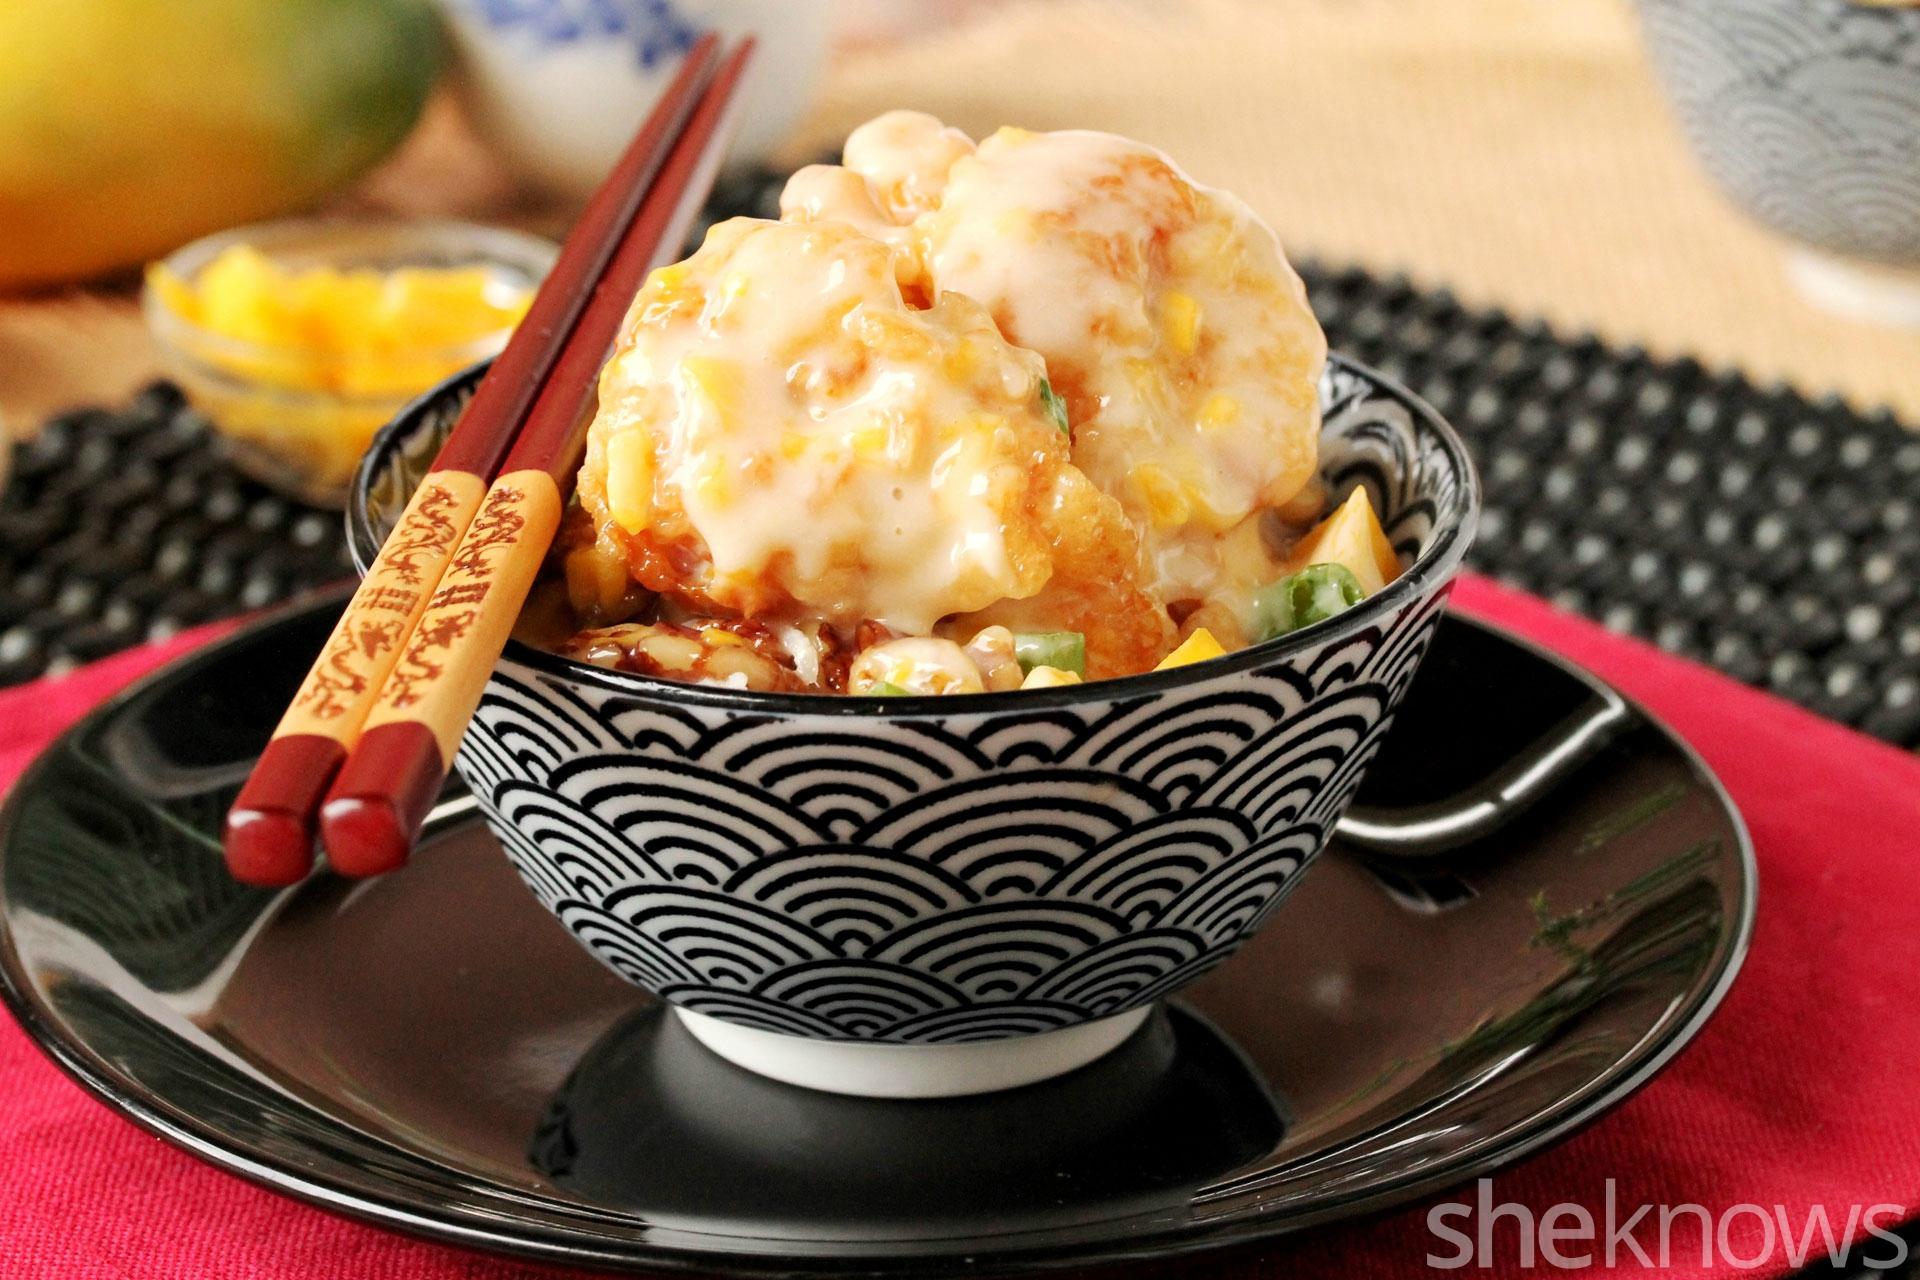 walnut shrimp with mango and garlic with rice